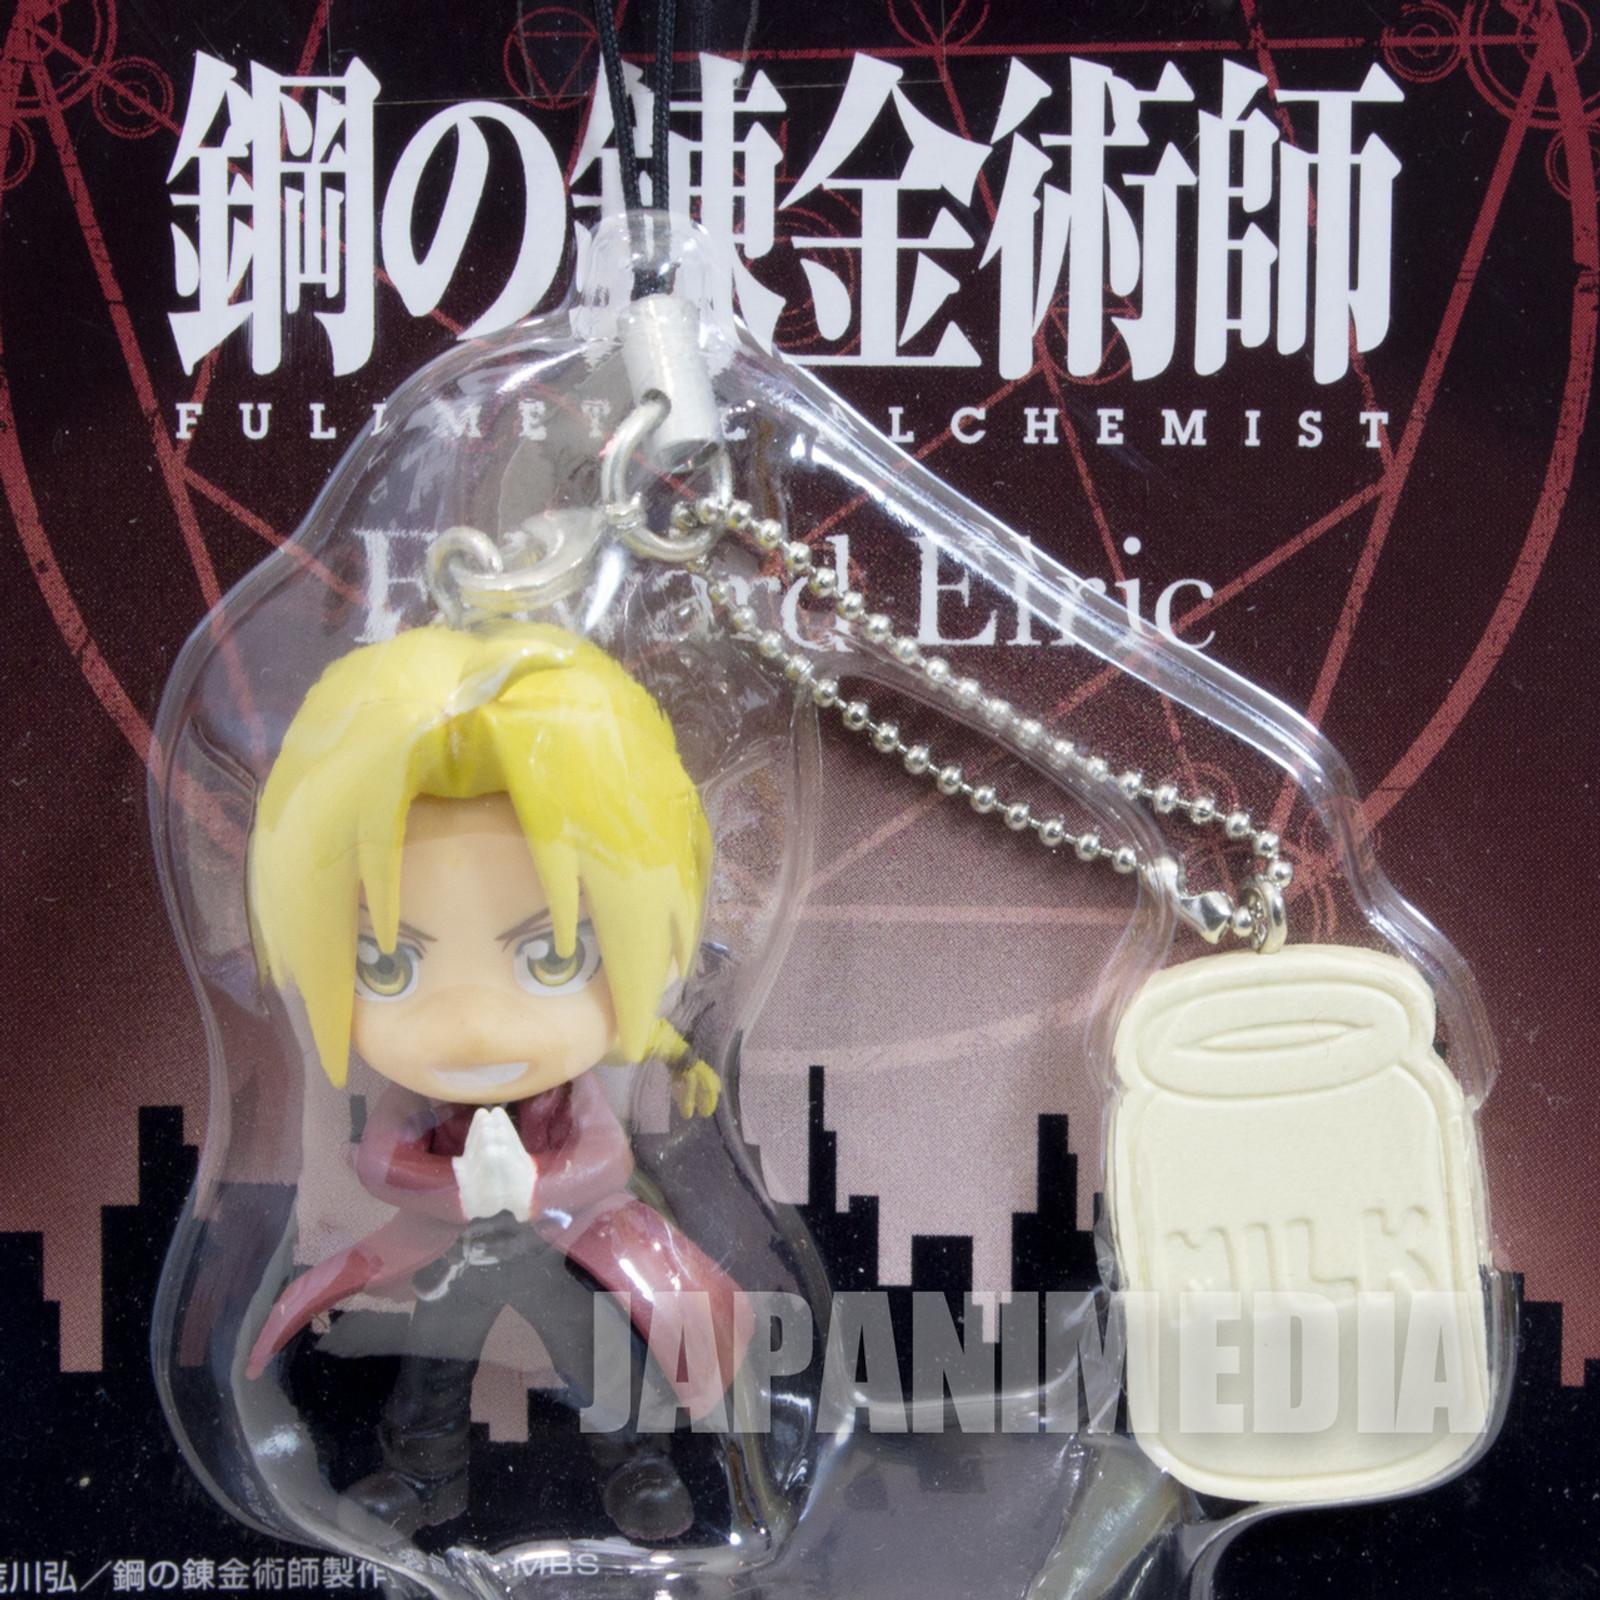 FullMetal Alchemist Edward Elric Figure Strap Banpresto JAPAN